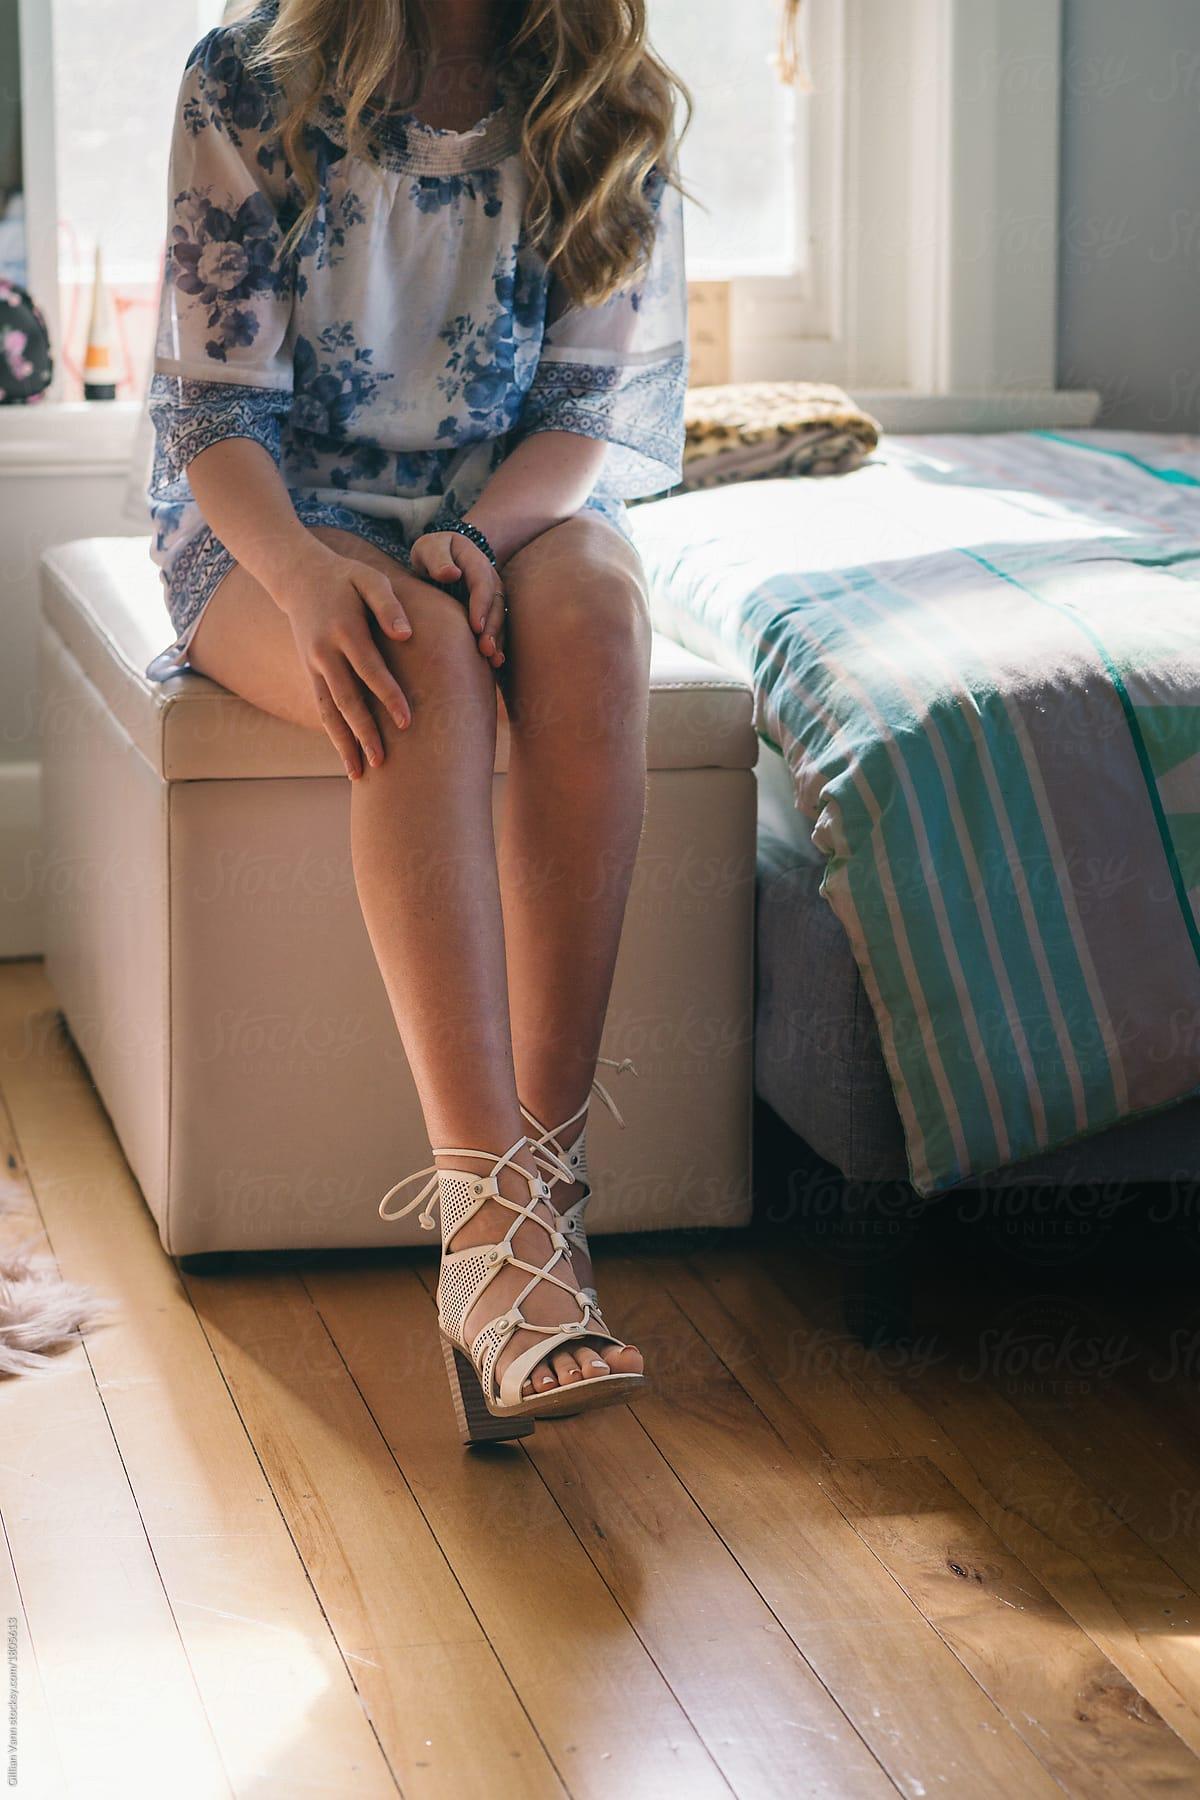 cc3ec5fddc07 teen girl in her bedroom putting on high heels by Gillian Vann for Stocksy  United